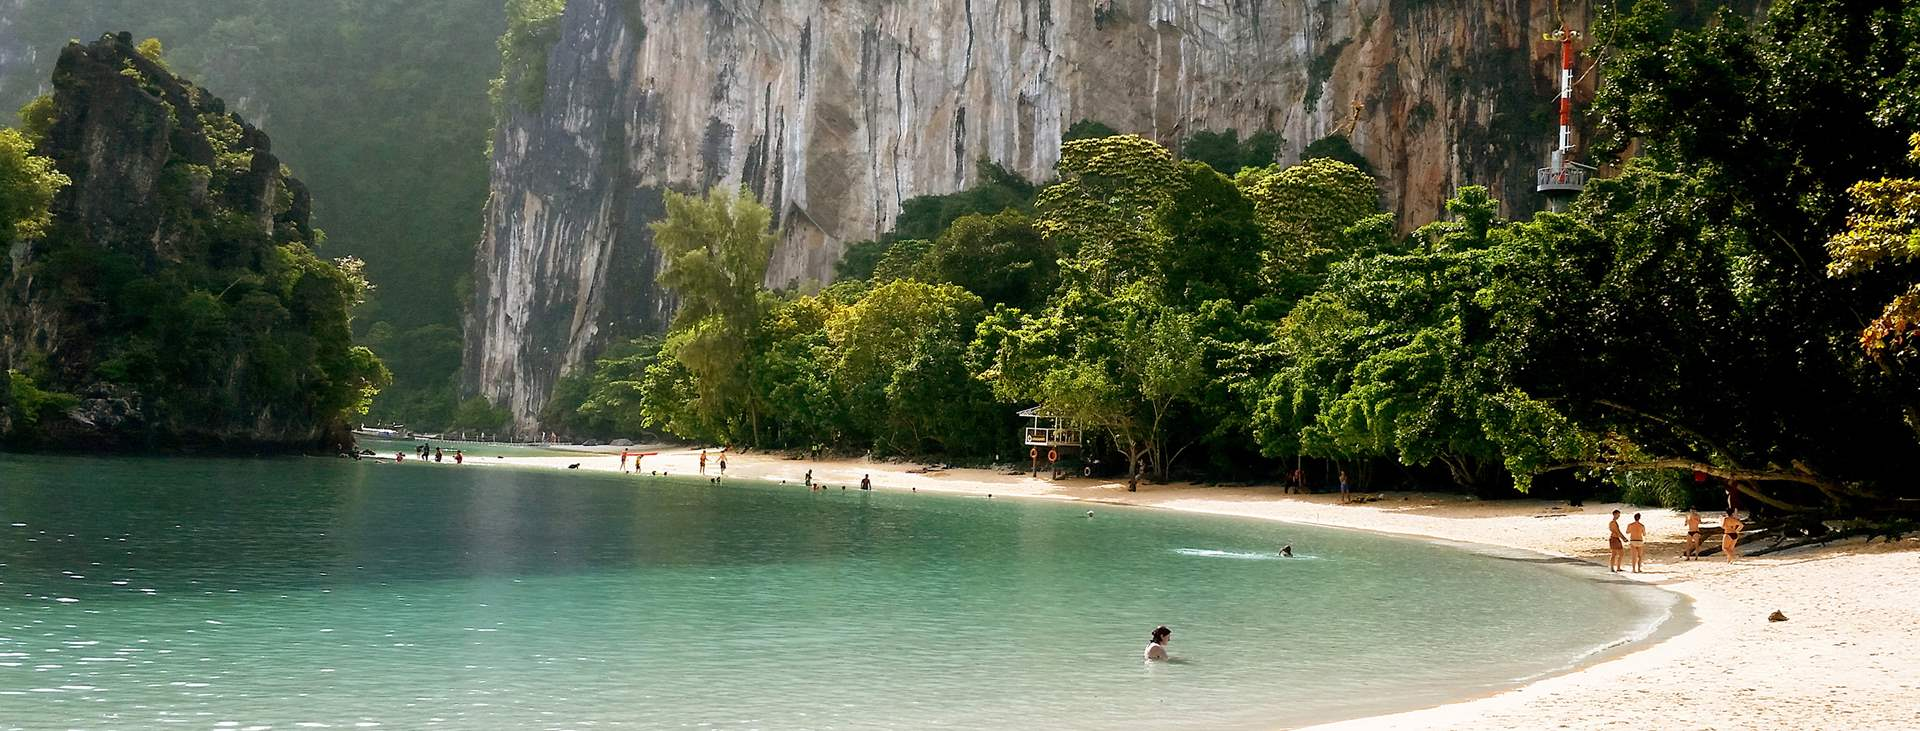 Varaa loma aurinkovarmaan Thaimaahan